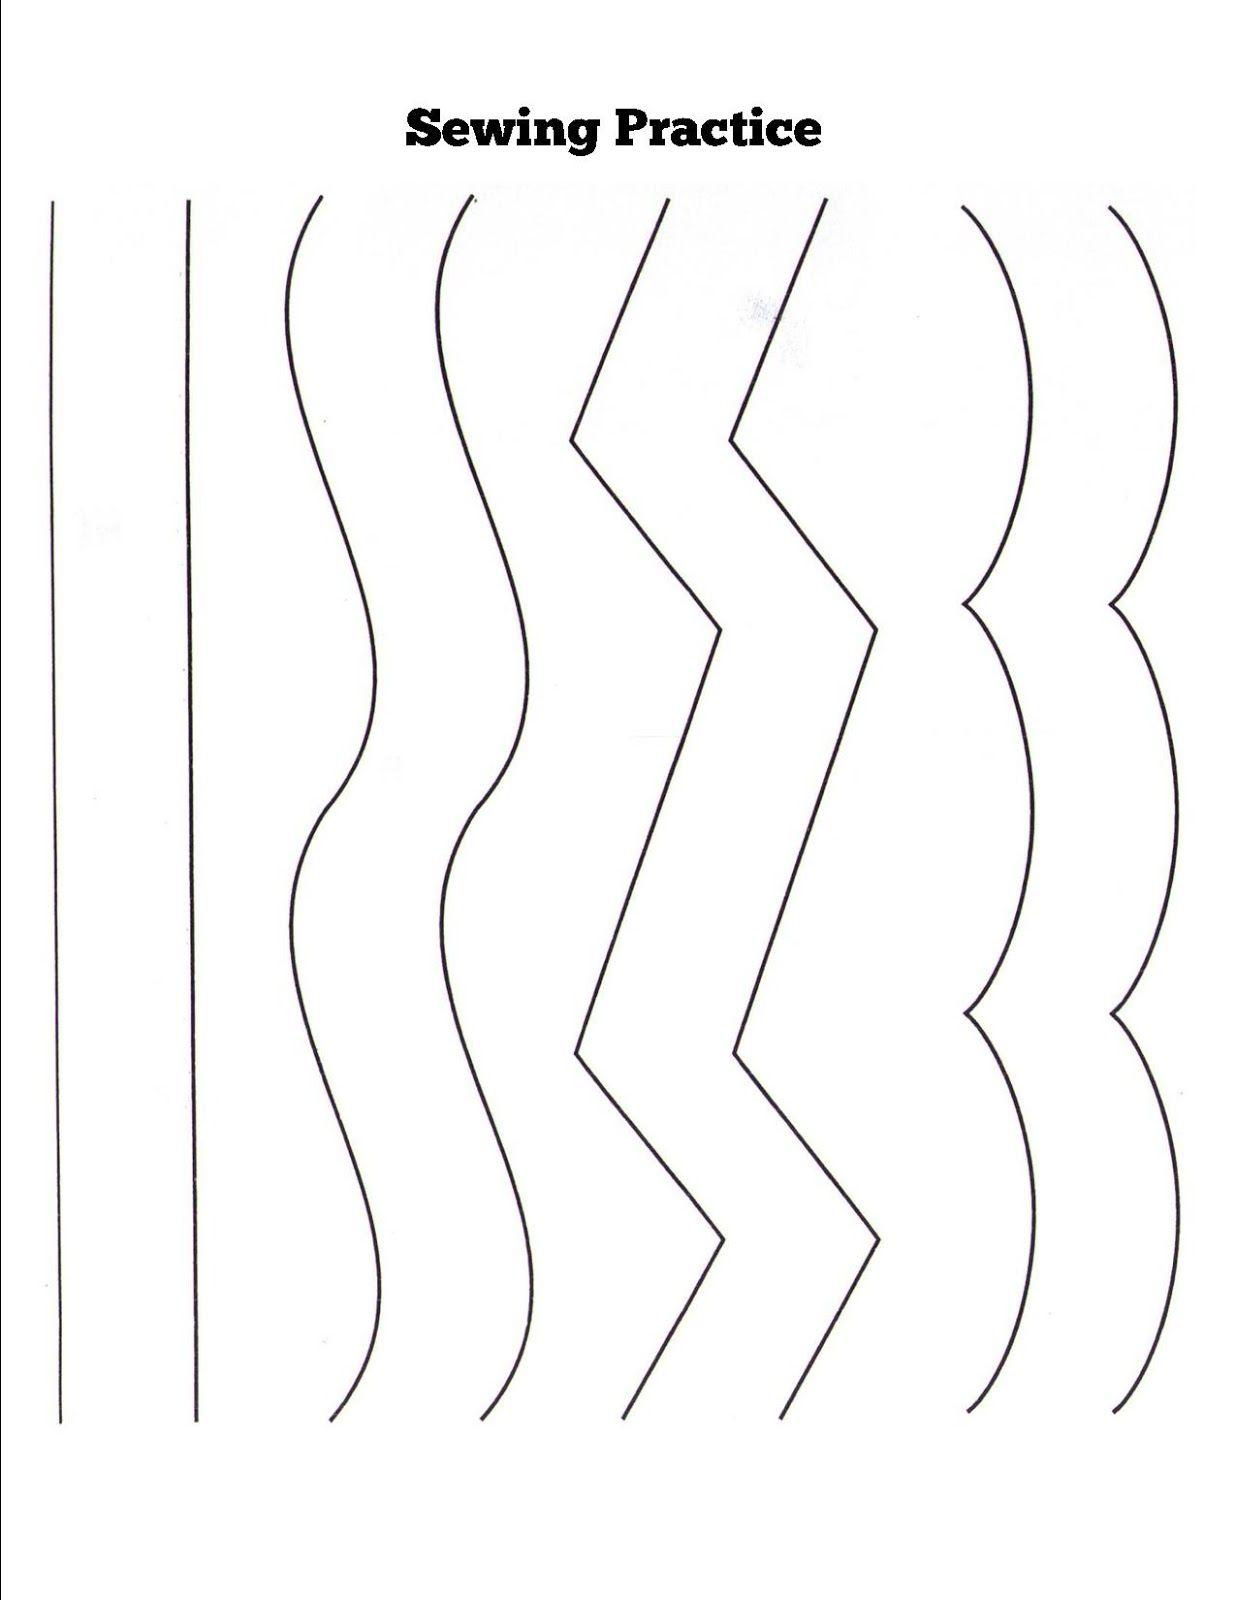 Sewing Practice Paper Photo 1 236 1 600 Pixels